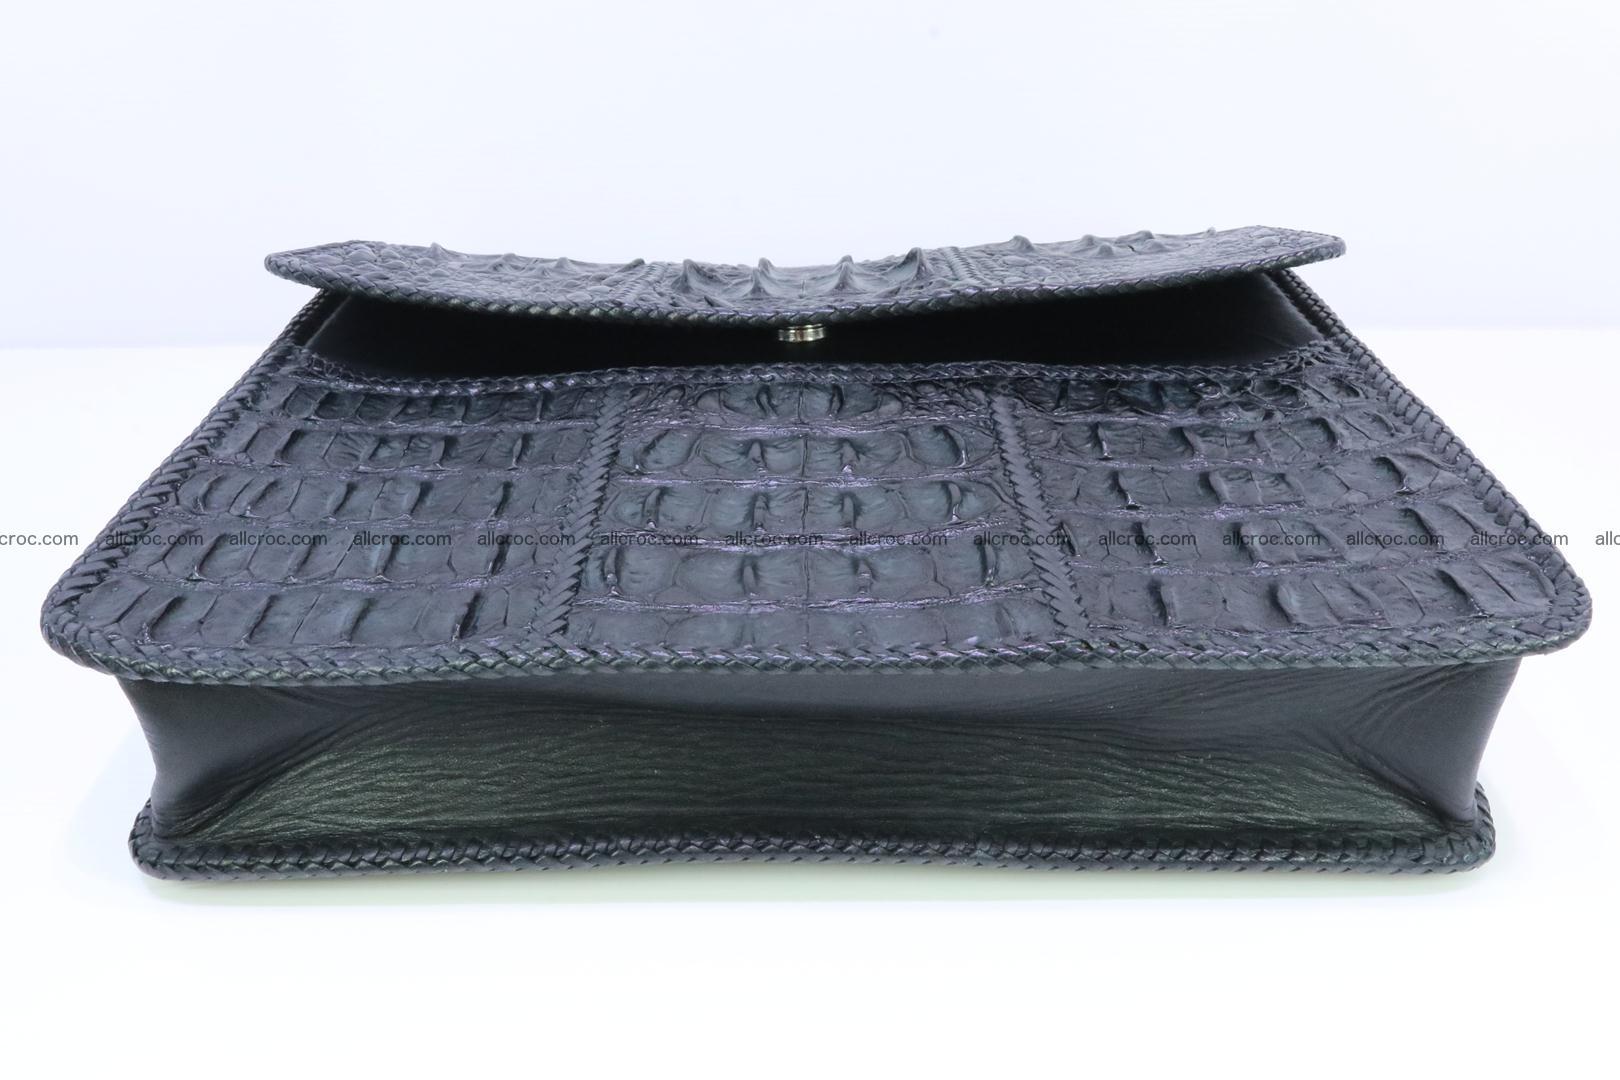 Crocodile skin shoulder bag with braided edges 147 Foto 6